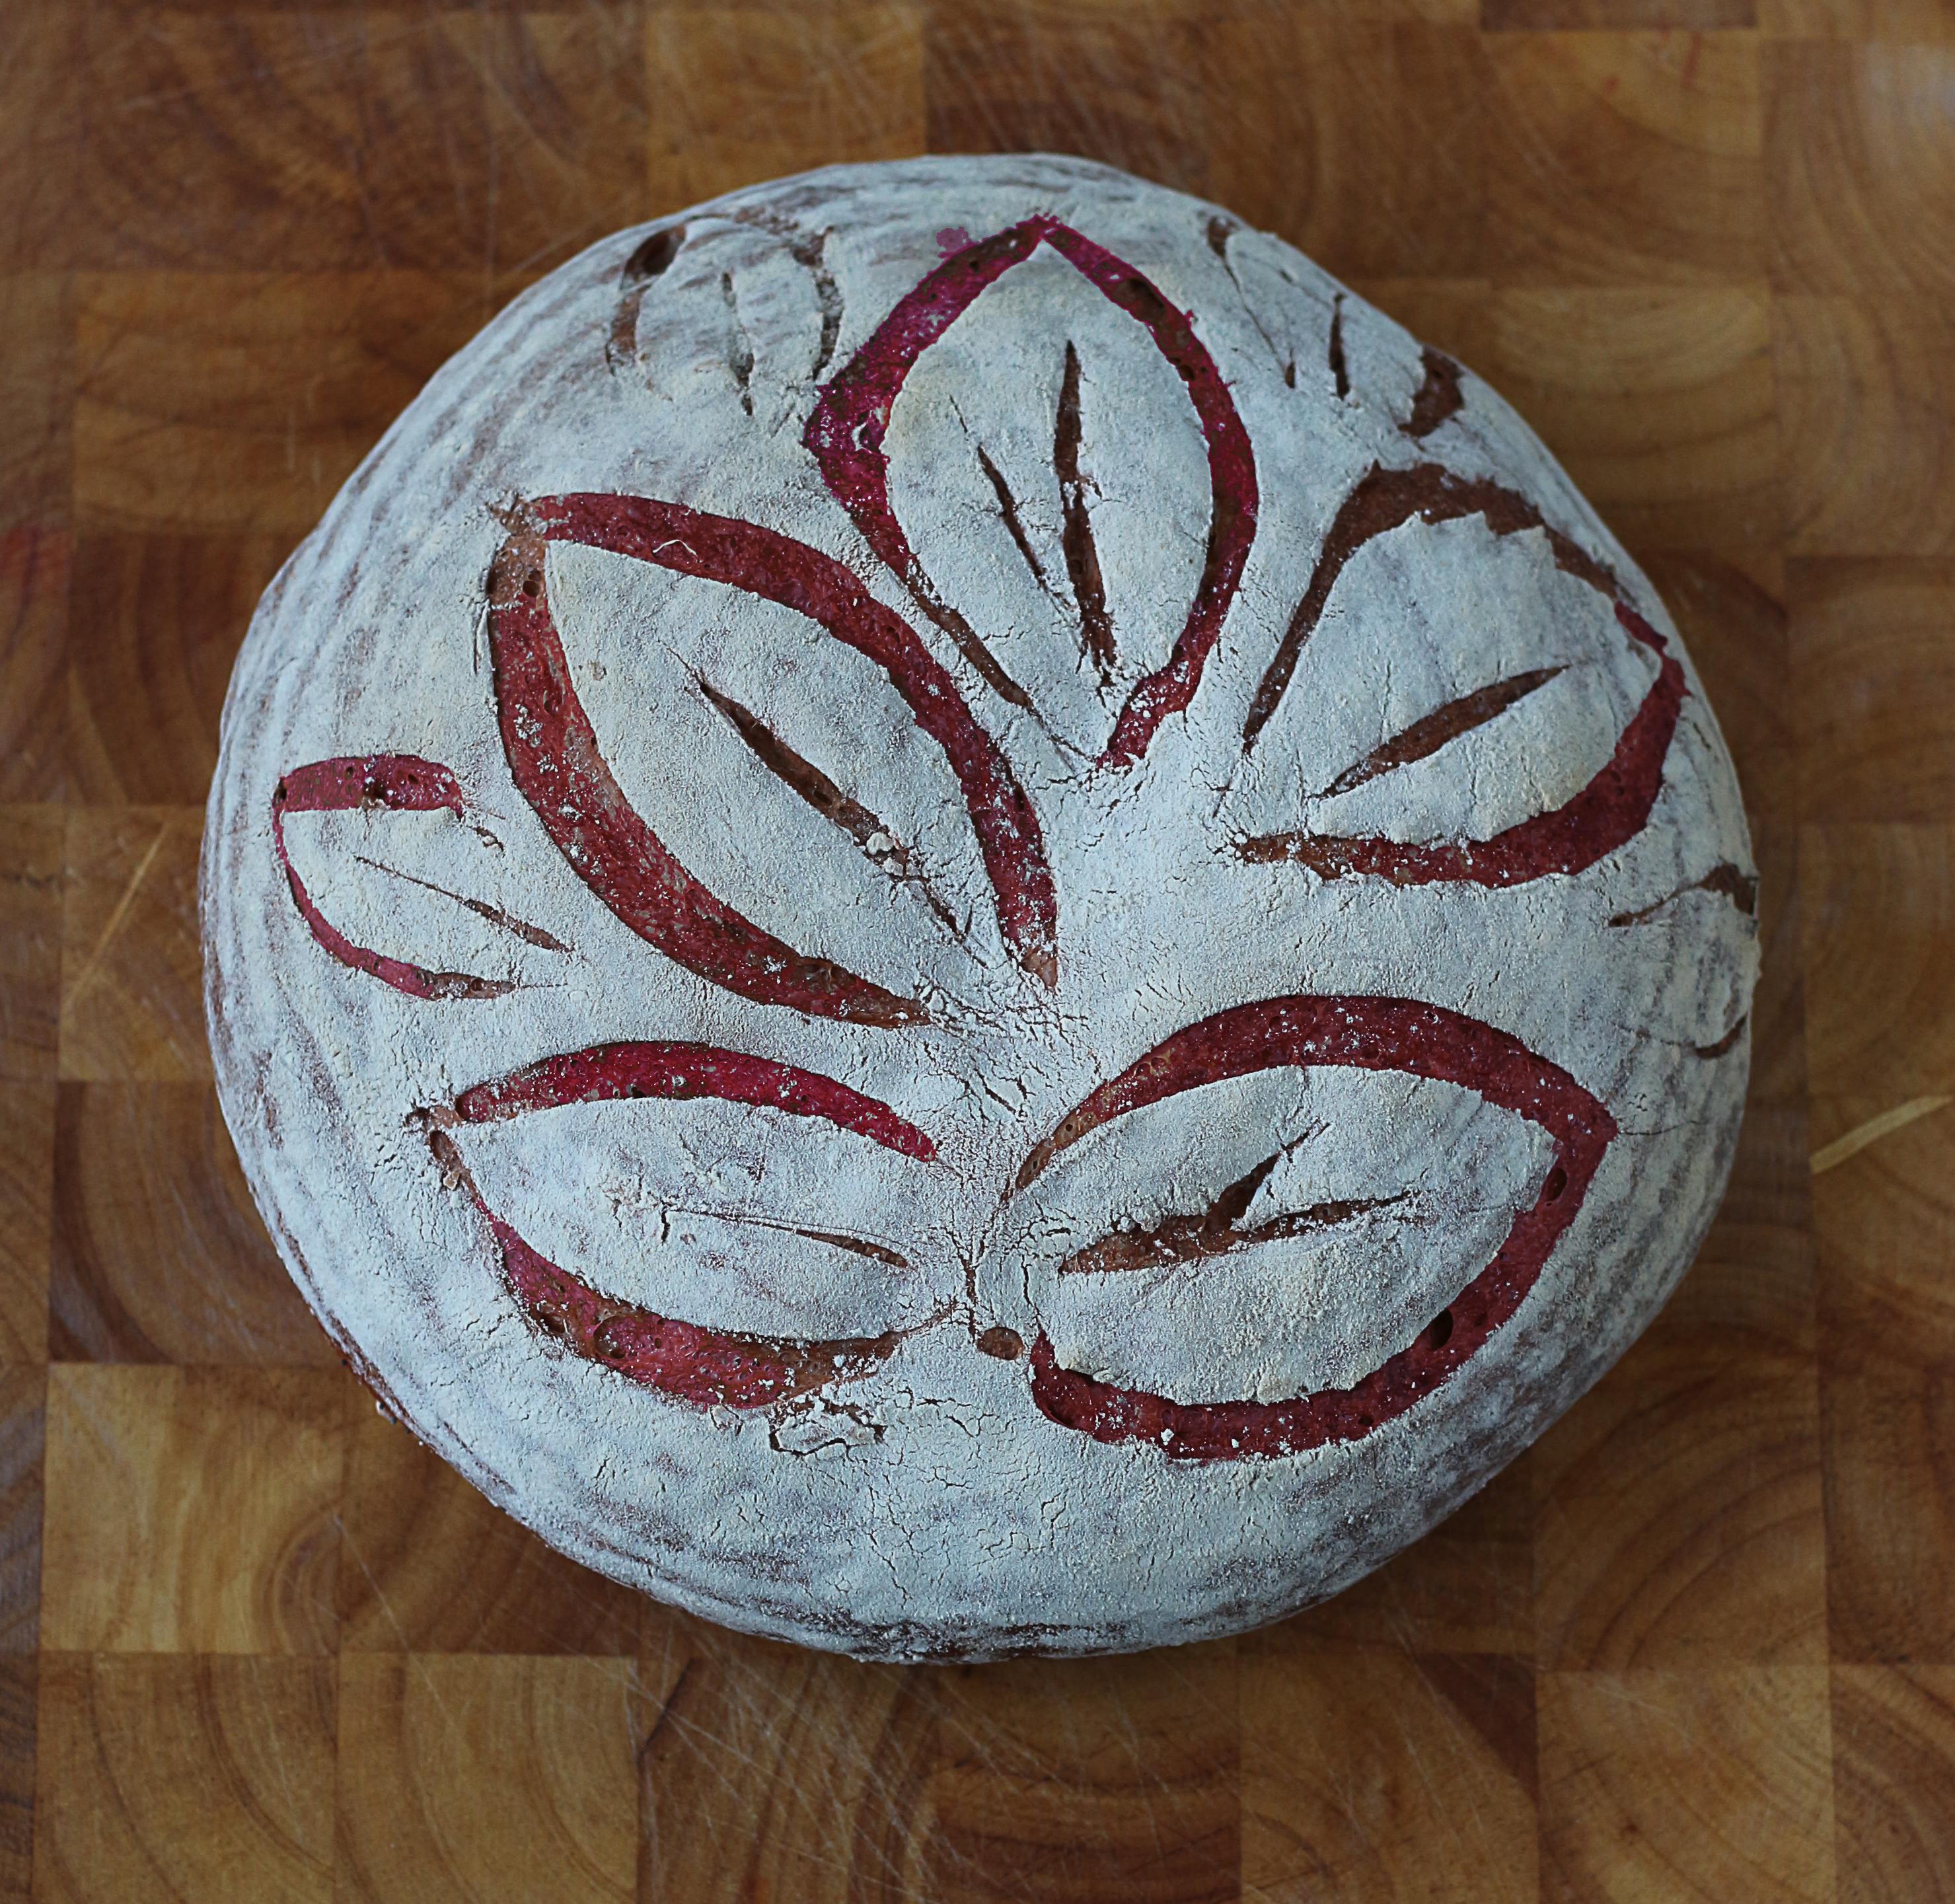 Beet loaf, score with a leaf pattern by Ink Sugar Spice